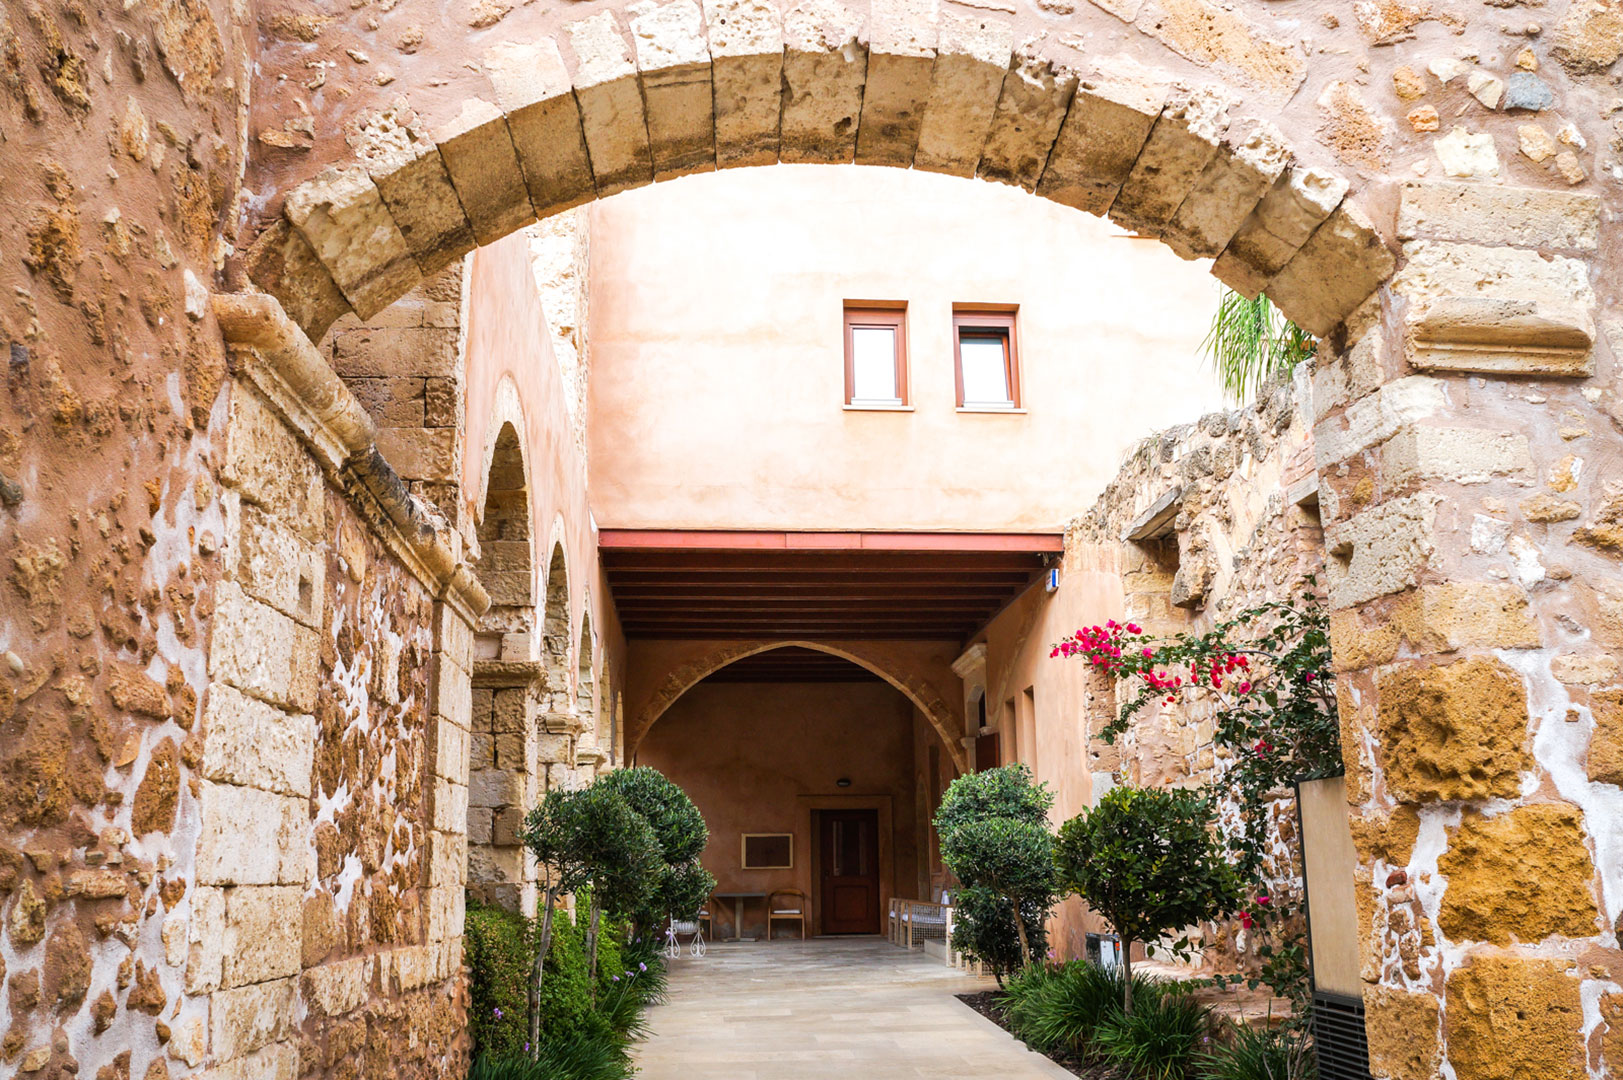 chania-crete-greece-la-vie-en-blog-all-rights-reserved-6